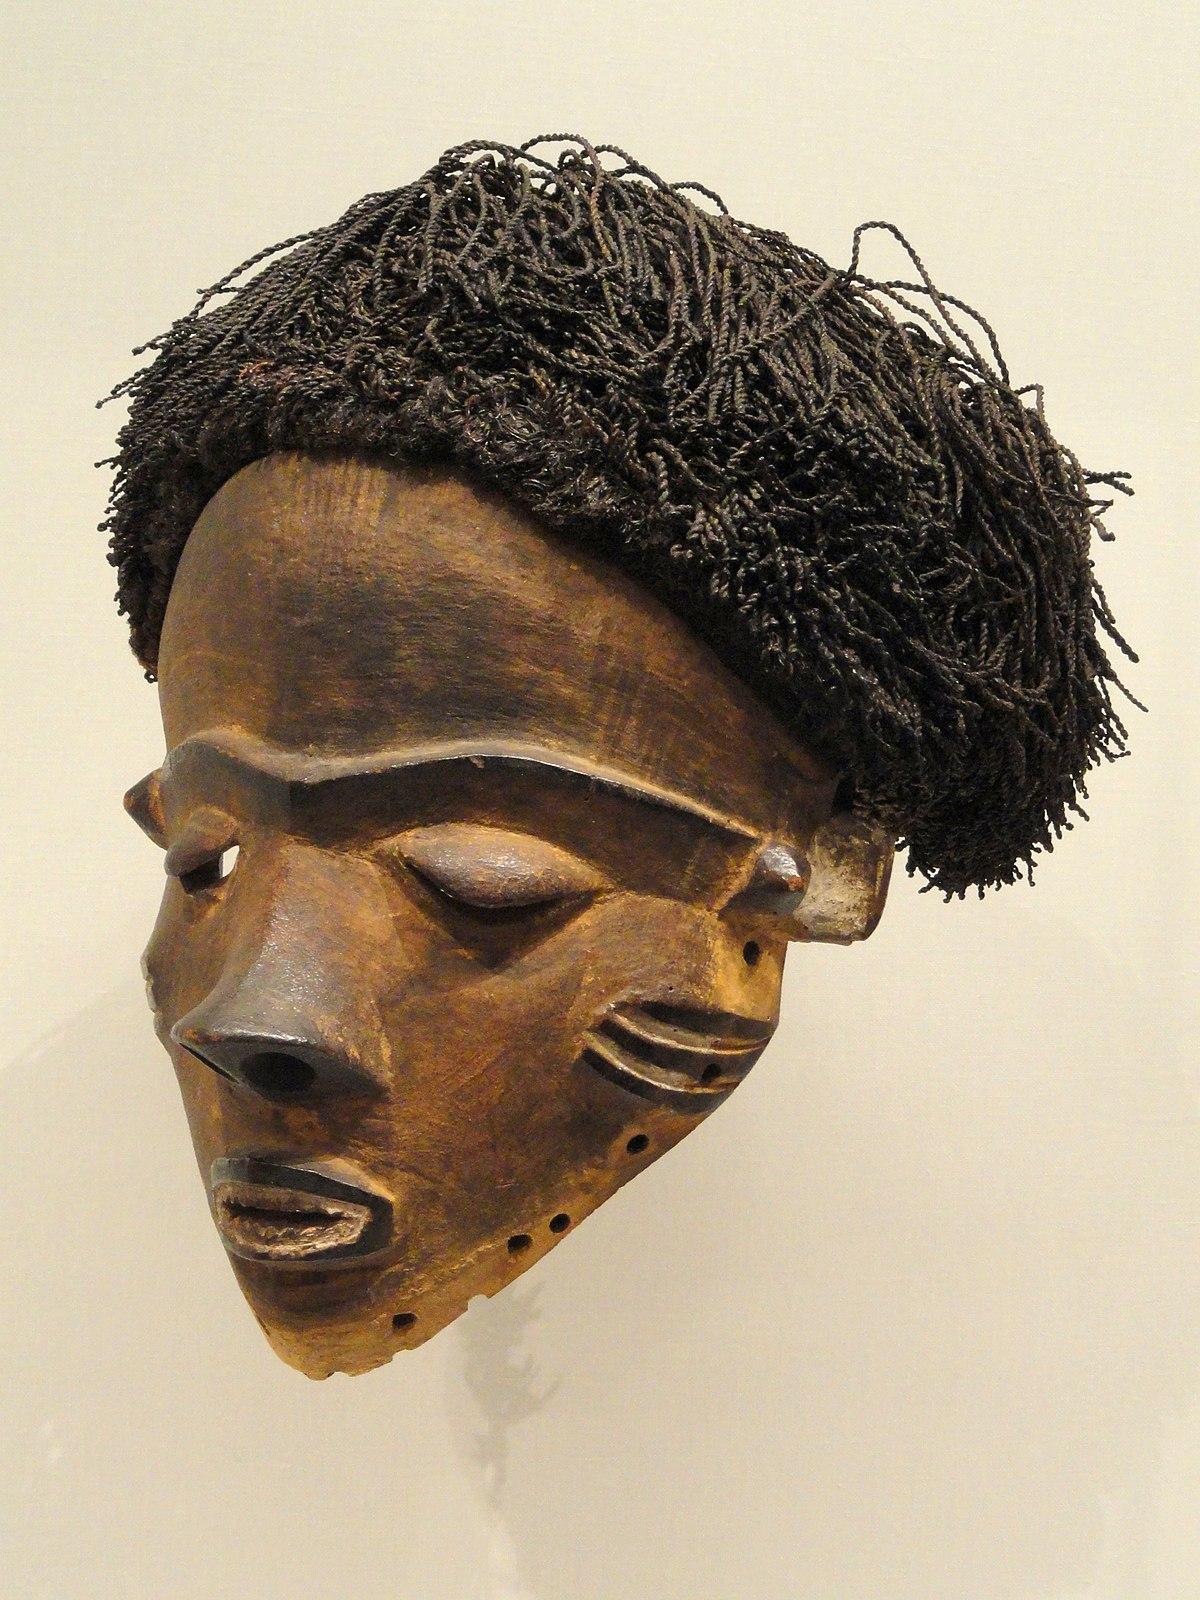 File:Female Face Mask (Gambanda), early 1900s, Central